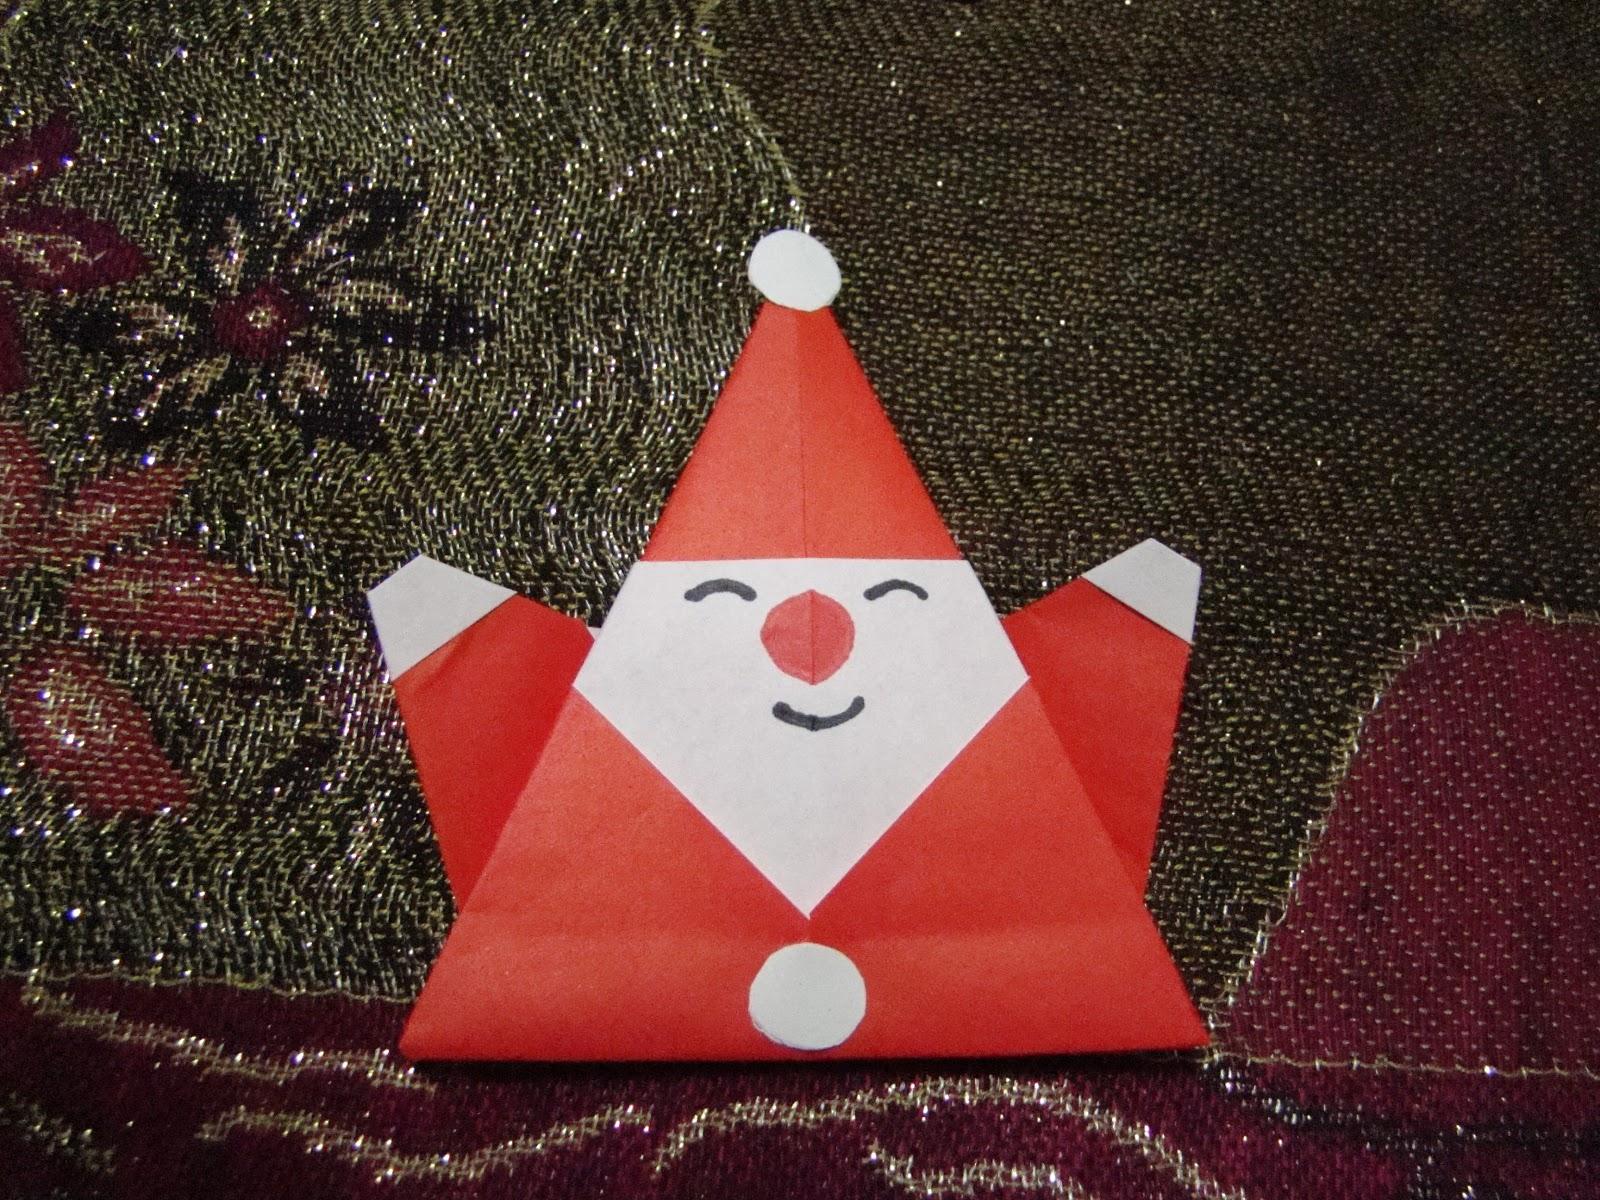 Origami maniacs origami santa claus 2 for Make origami santa claus